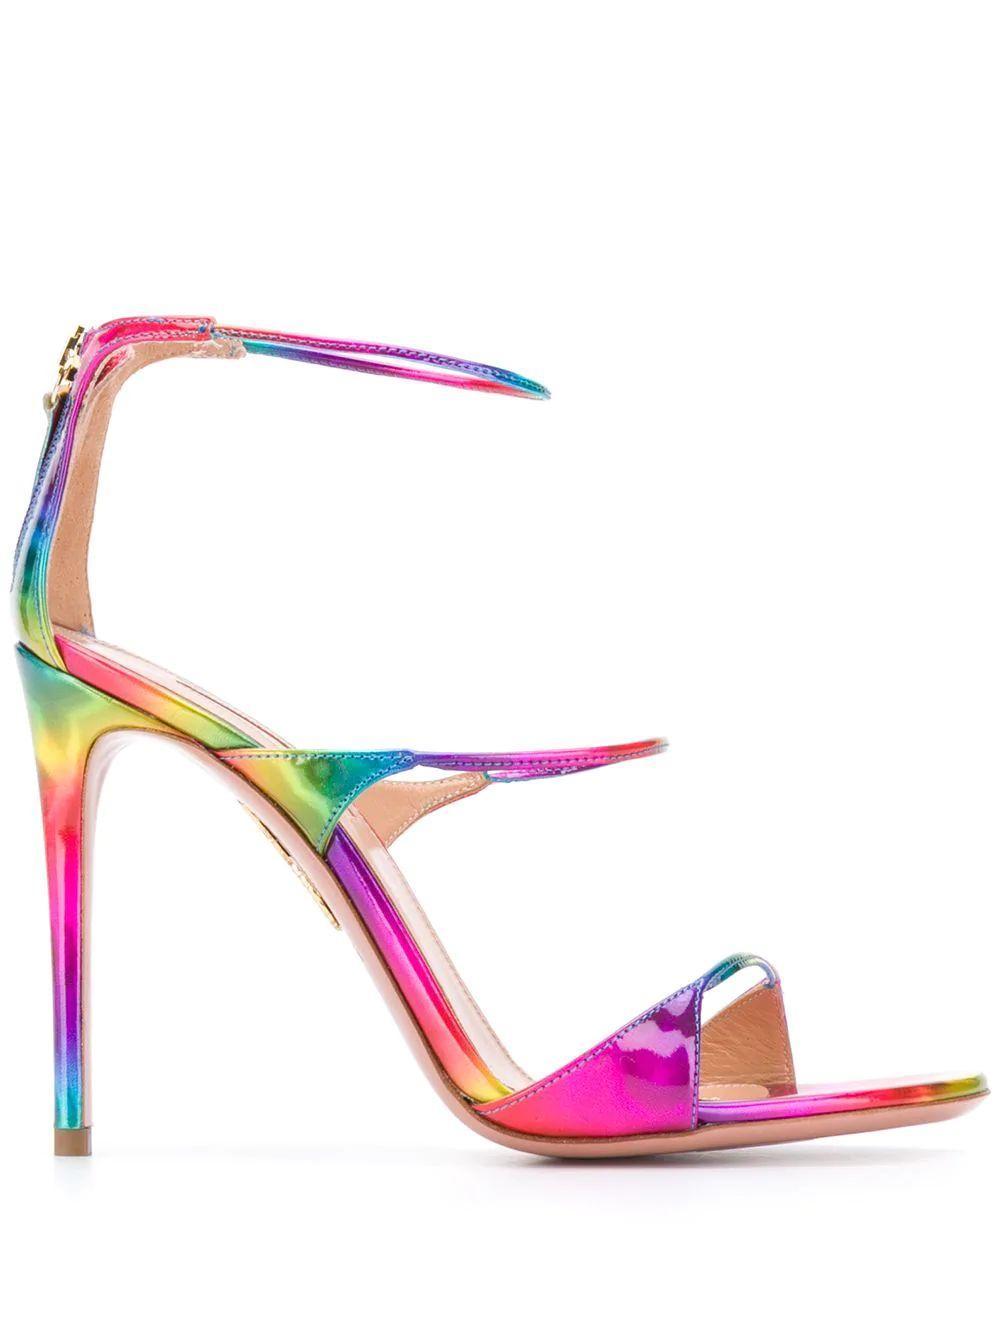 Minute Rainbow 105MM 3 Strap Sandal